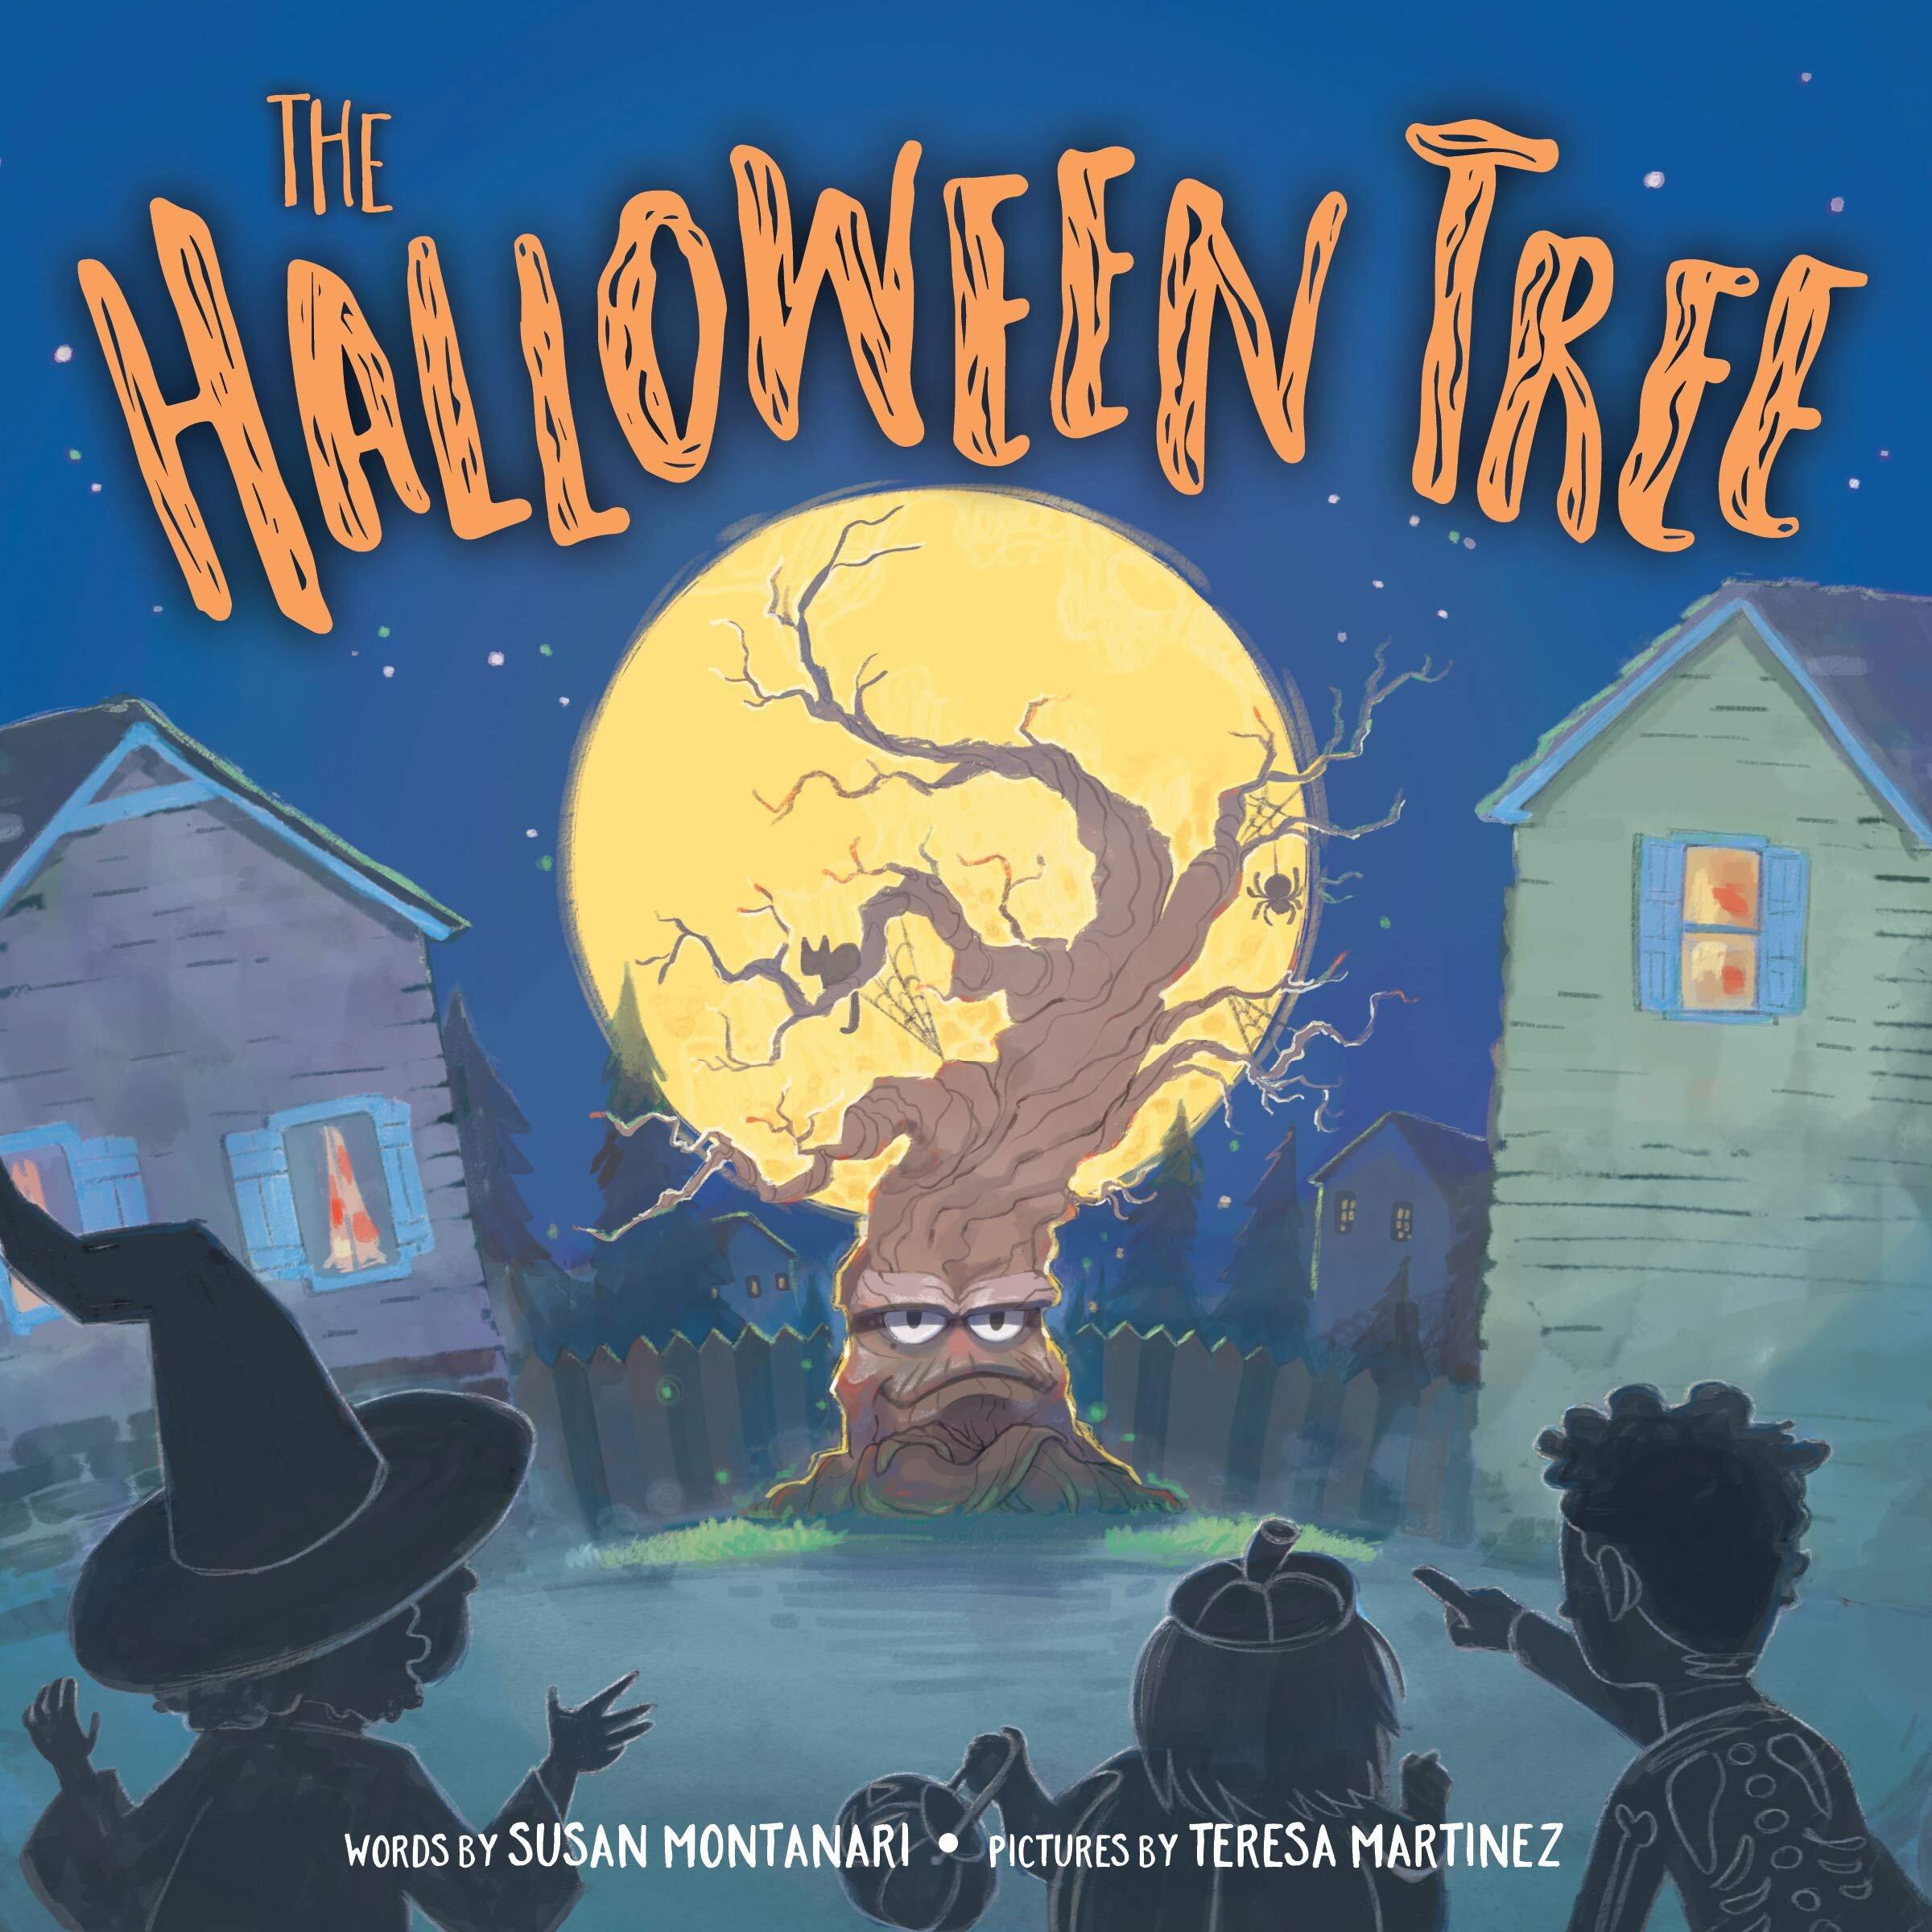 Best Halloween Picture Books of 2019 - The Halloween Tree.jpg